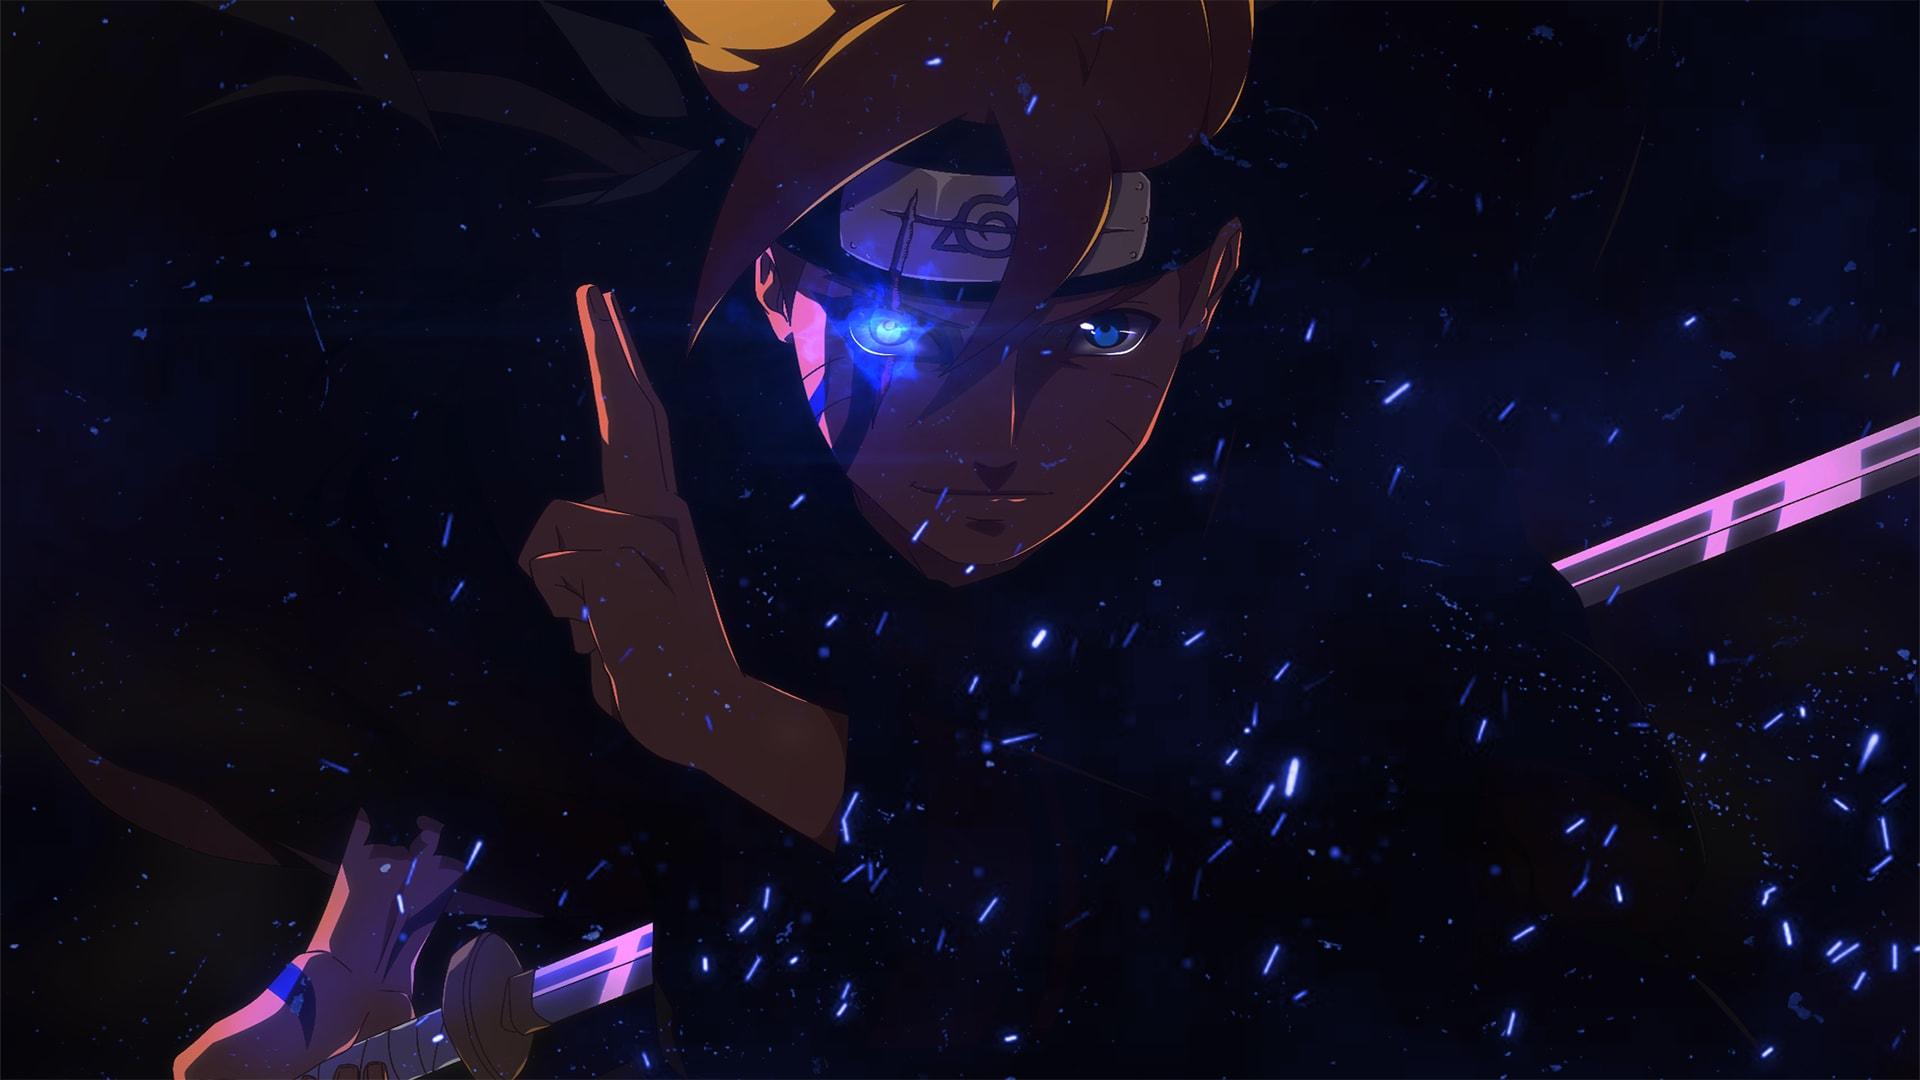 Wallpaper of Anime Blue Boruto Sword Naruto background